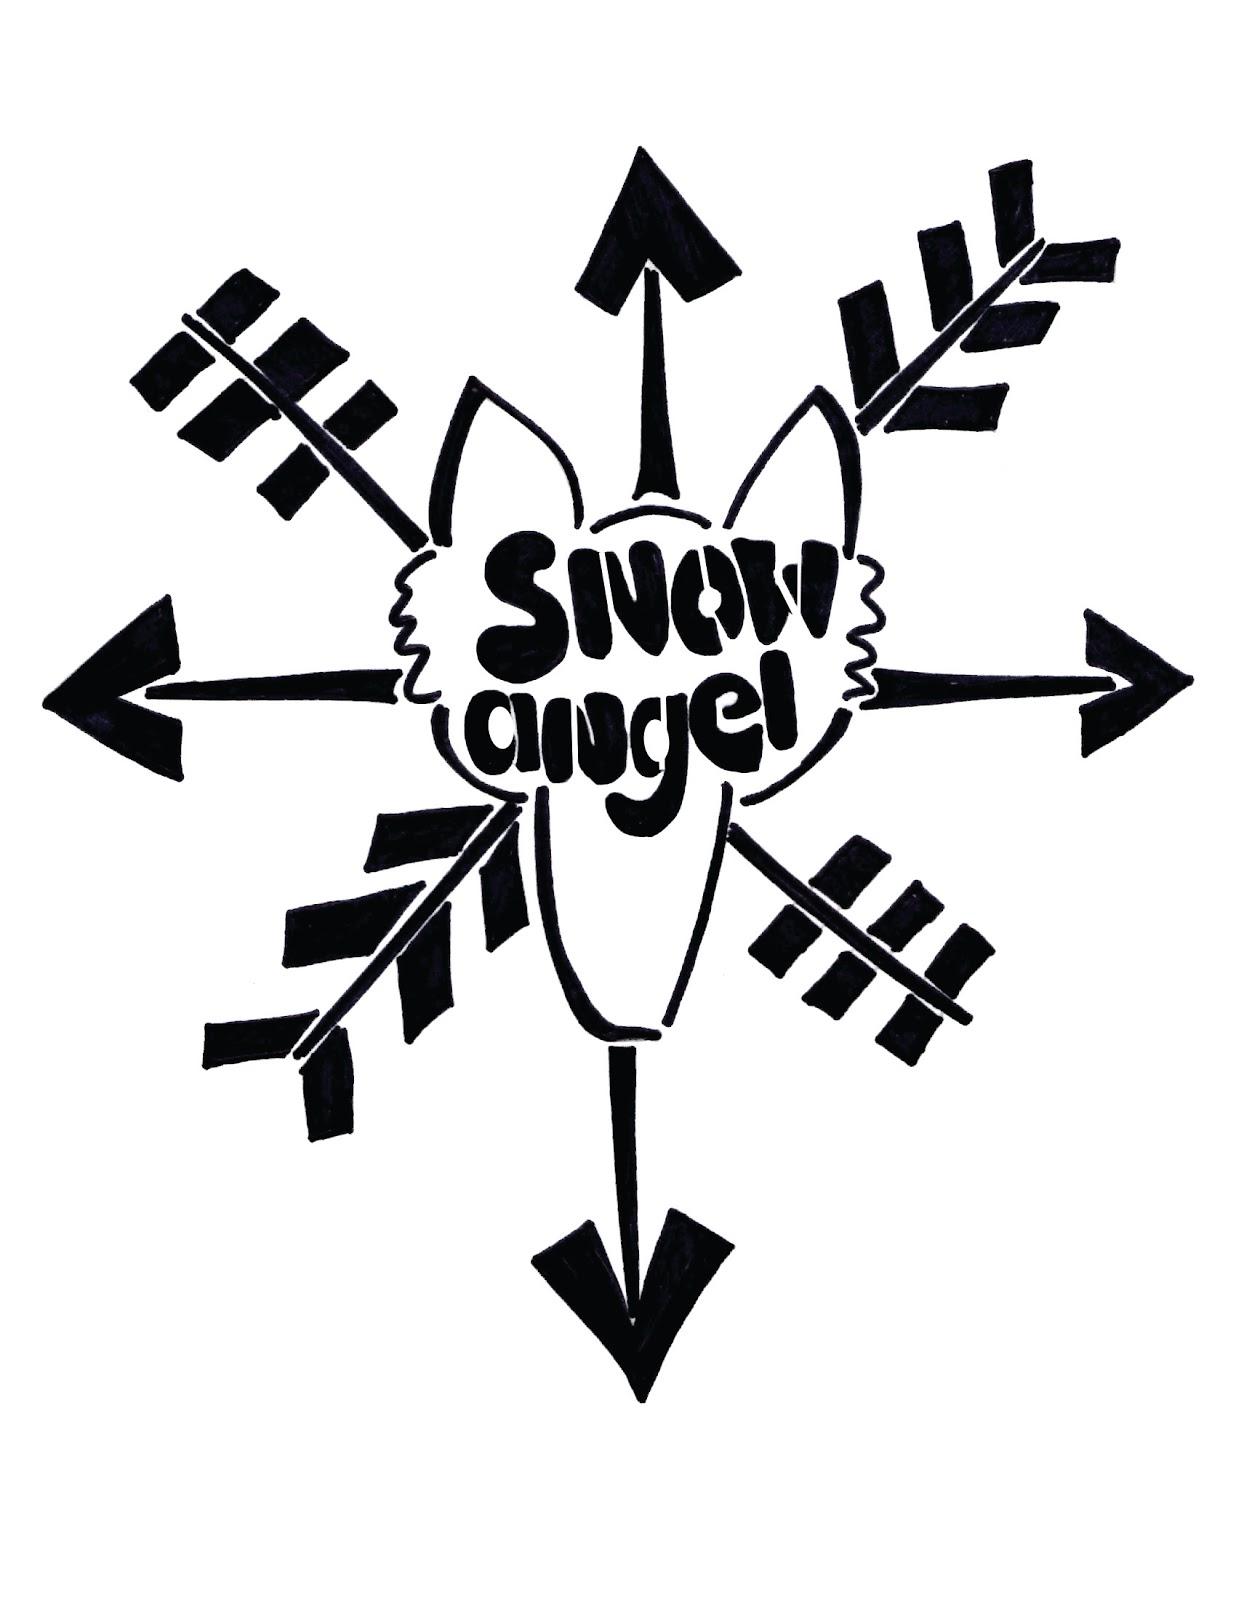 1236x1600 Snow Angel Band Logo With Variation Elaine Elwick Barr Portfolio